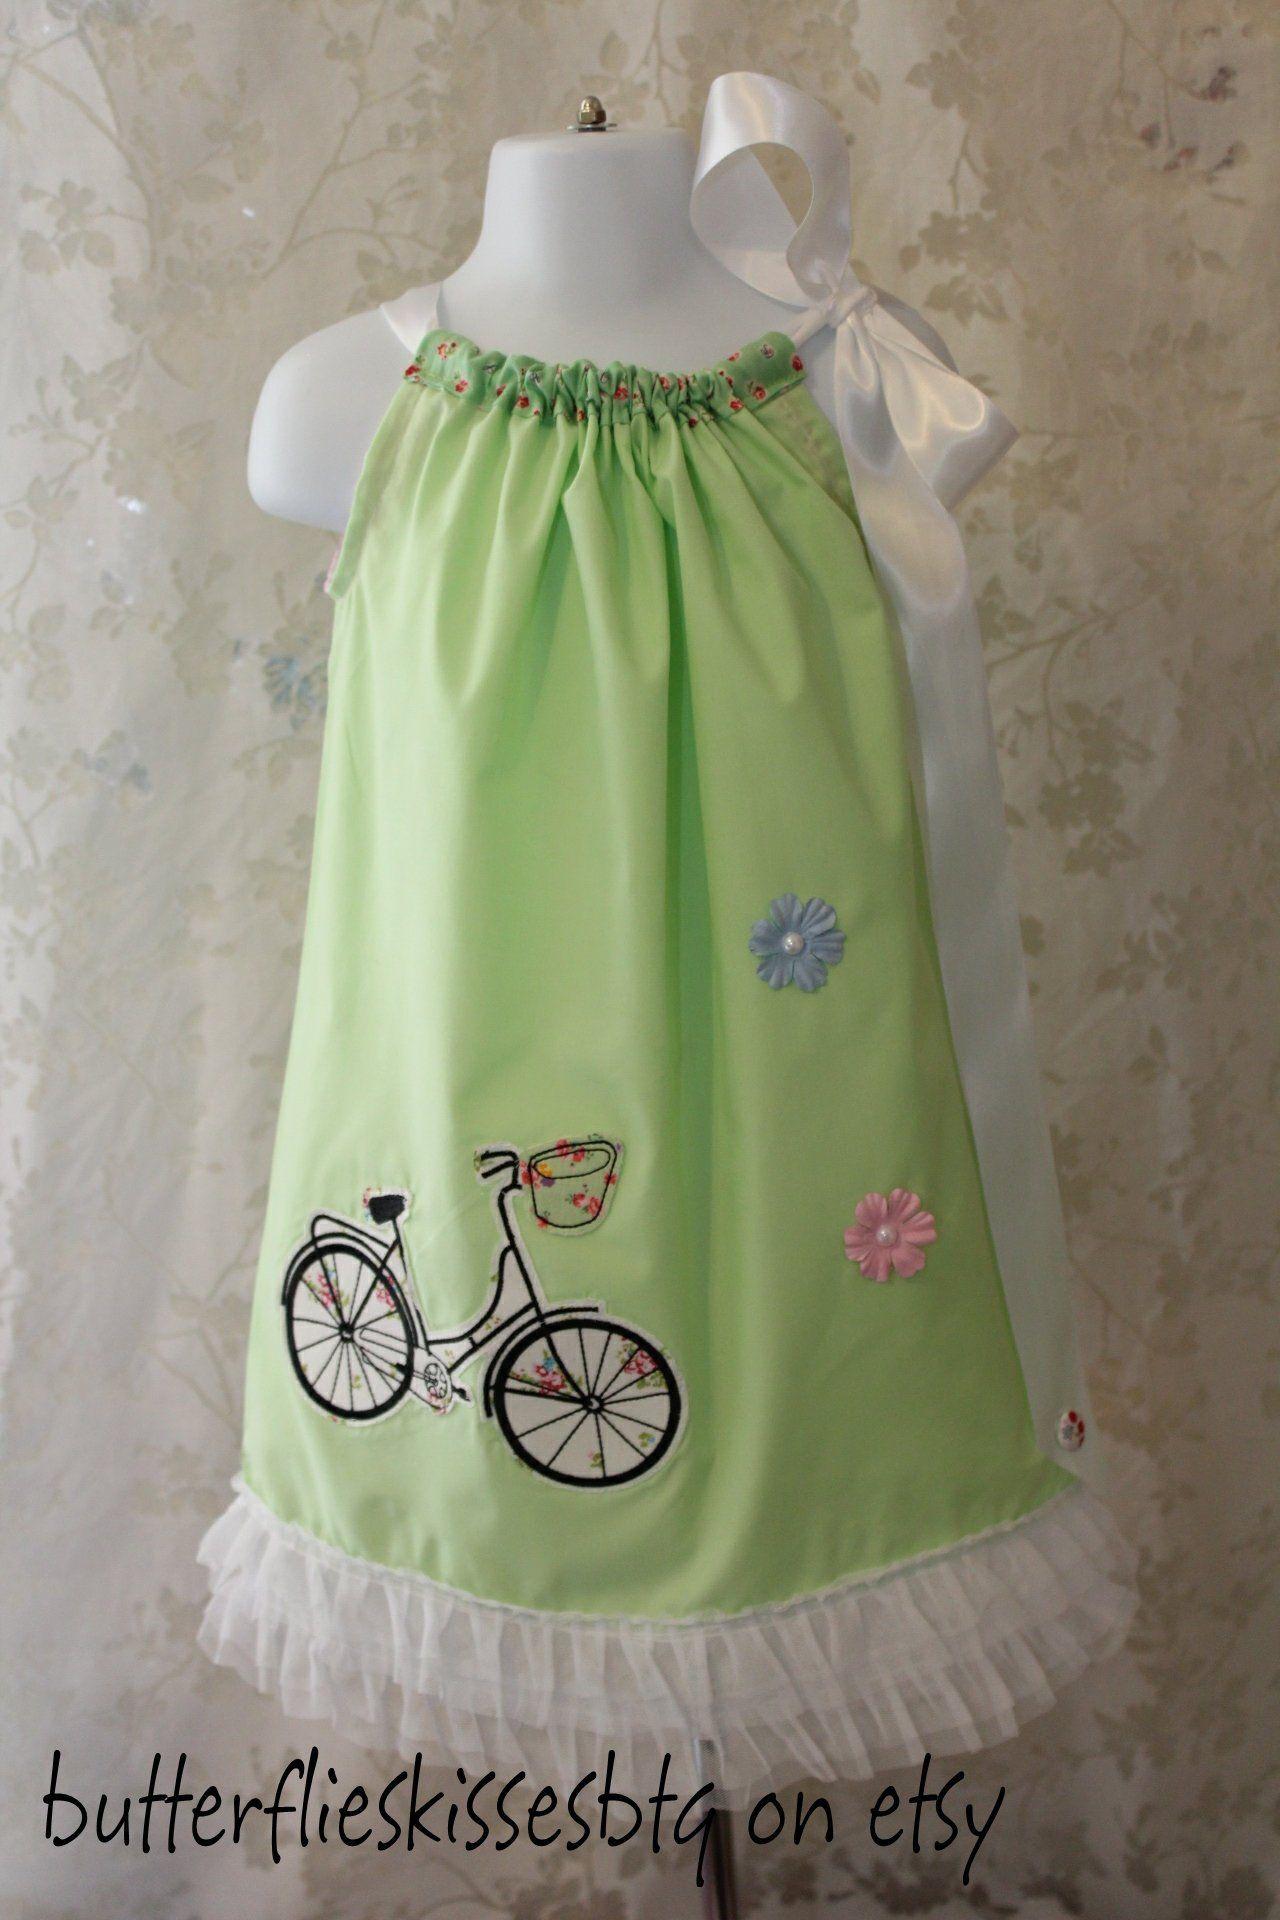 New Handmade Couture Pillowcase Dress Size 4t Lime Green With Etsy Pillowcase Dress Little Dresses Spring Wear [ 1920 x 1280 Pixel ]